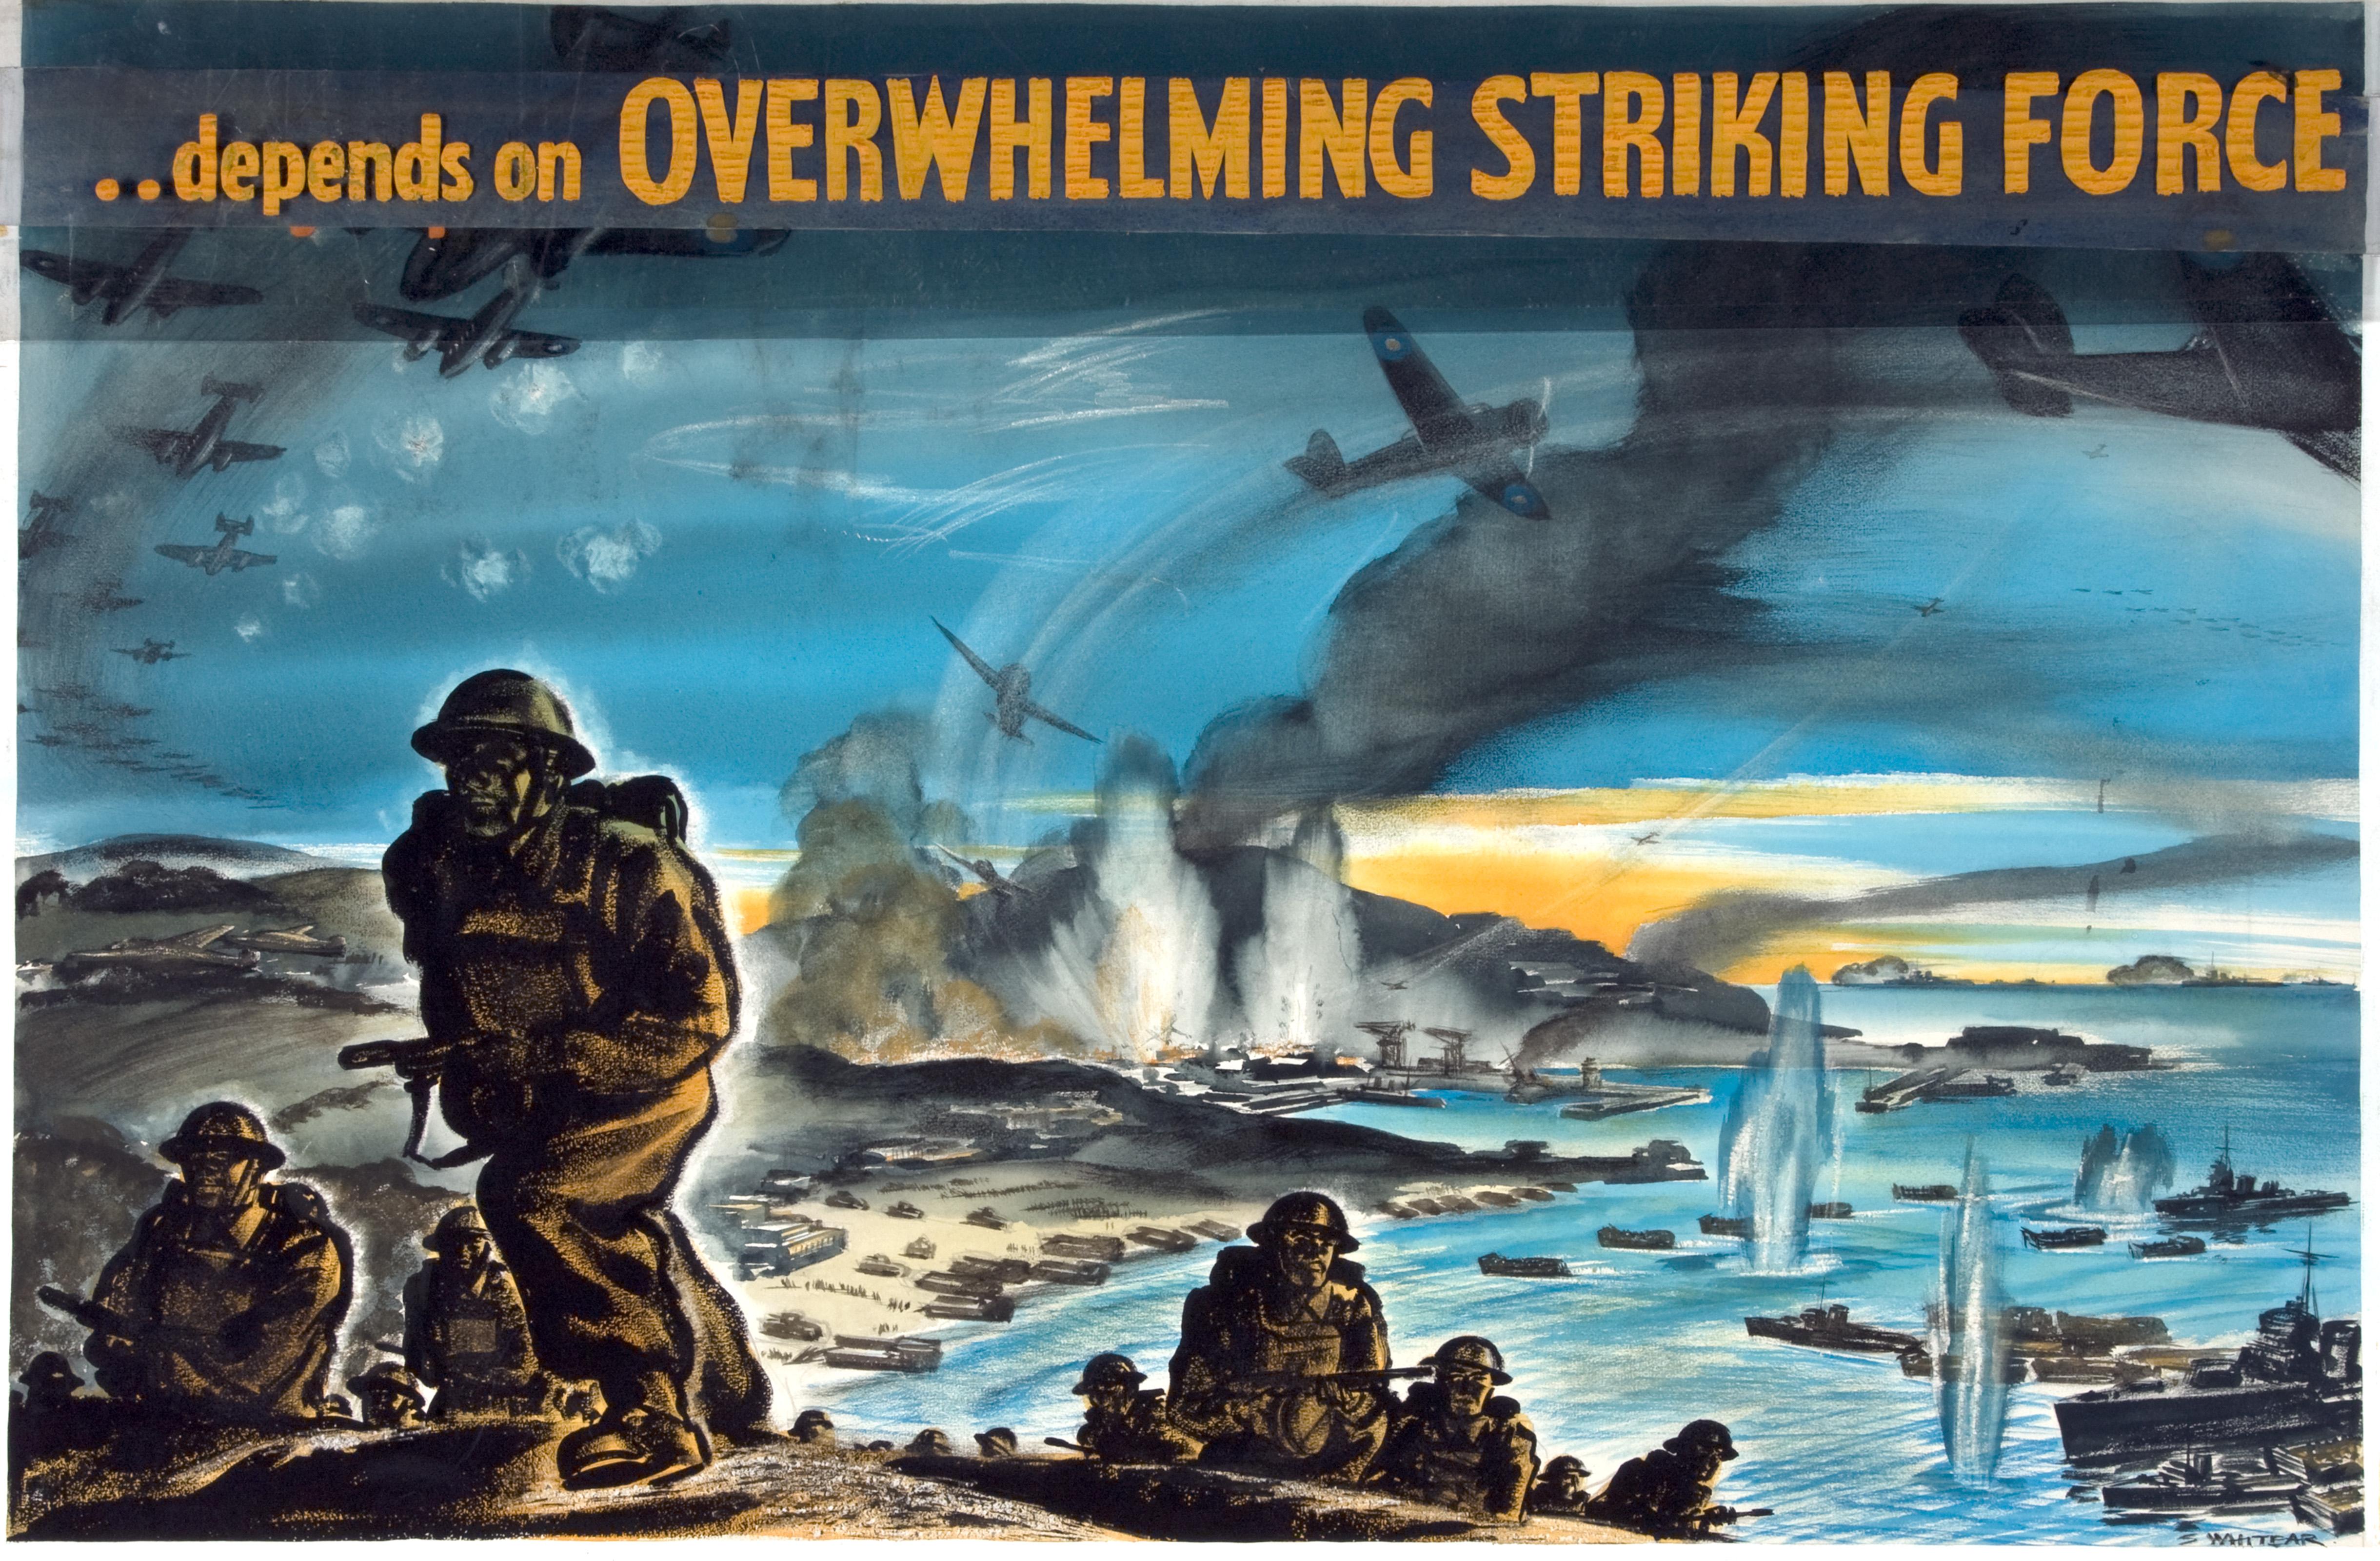 INF3-139 War Effort Victory depends on an overwhelming striking force Artist S Whitear.jpg